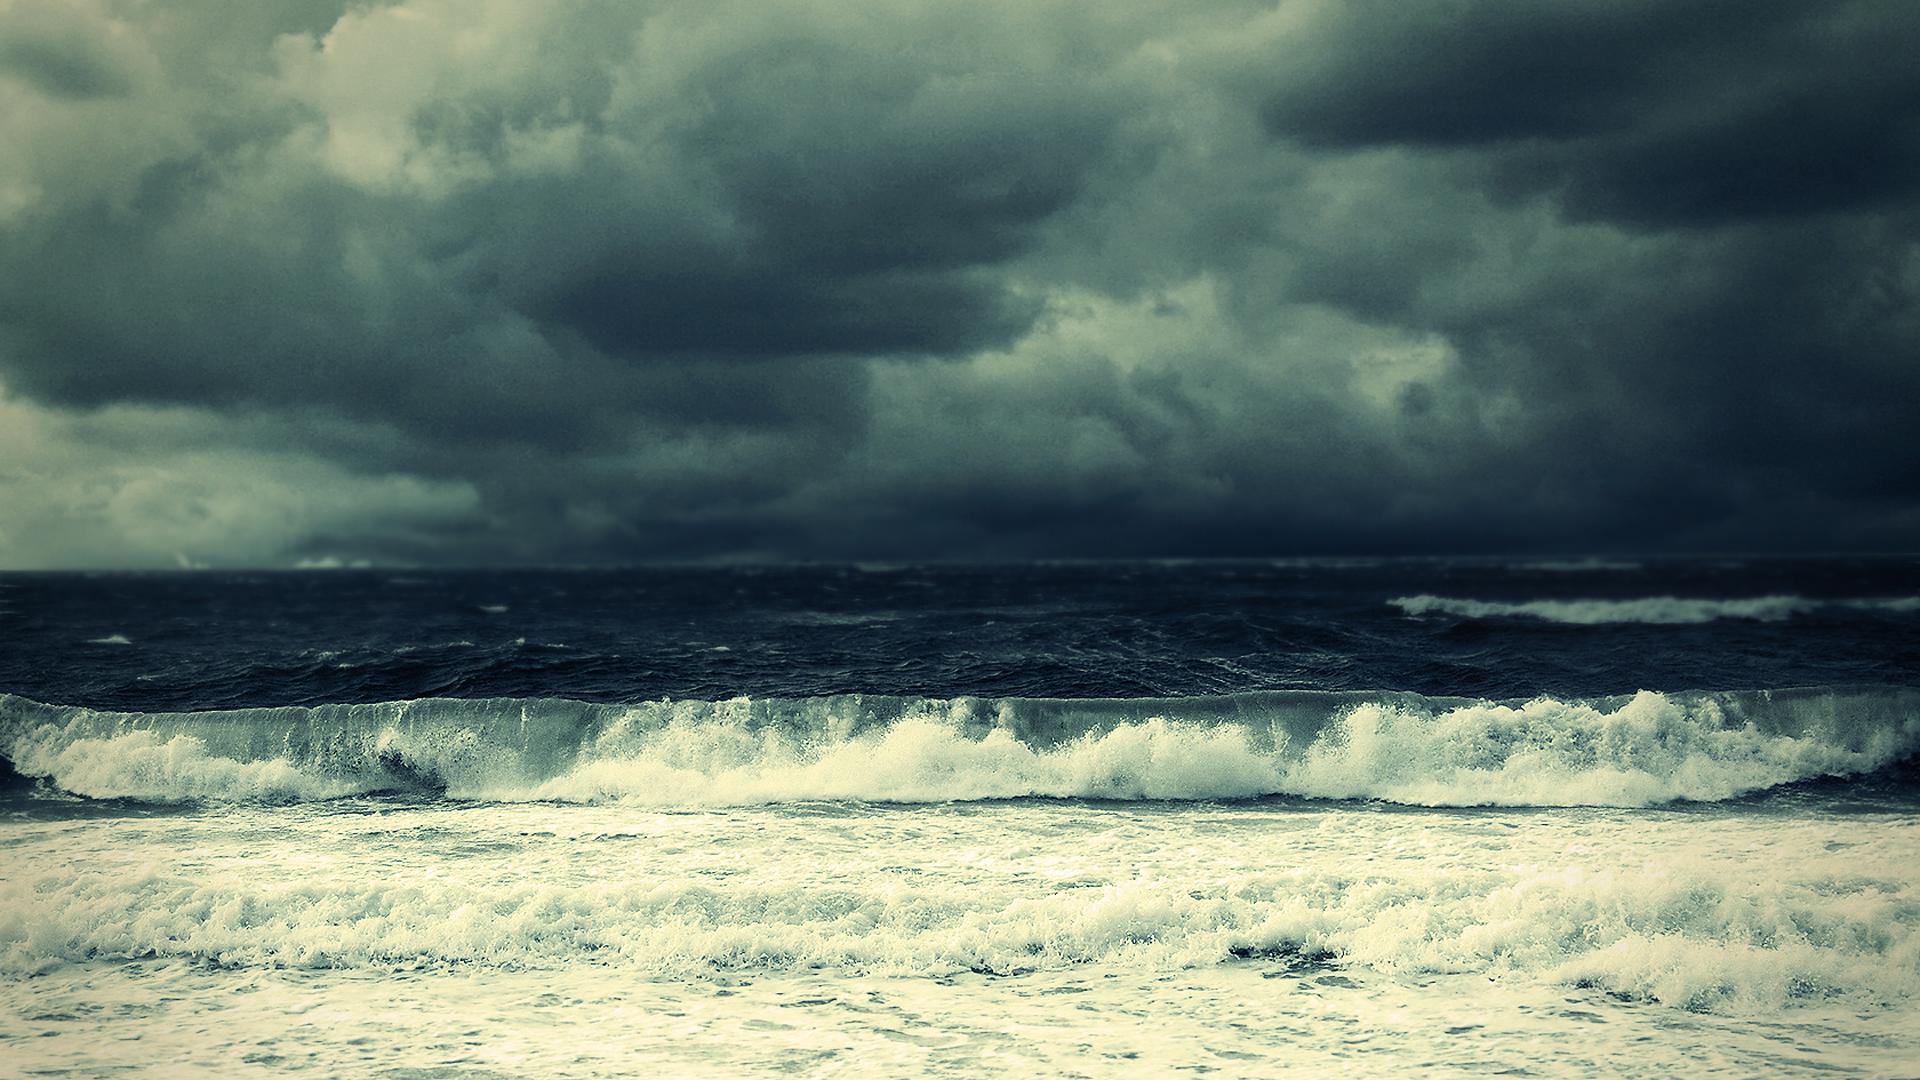 Stormy Ocean Wallpaper 1920x1080 Stormy Ocean 1920x1080